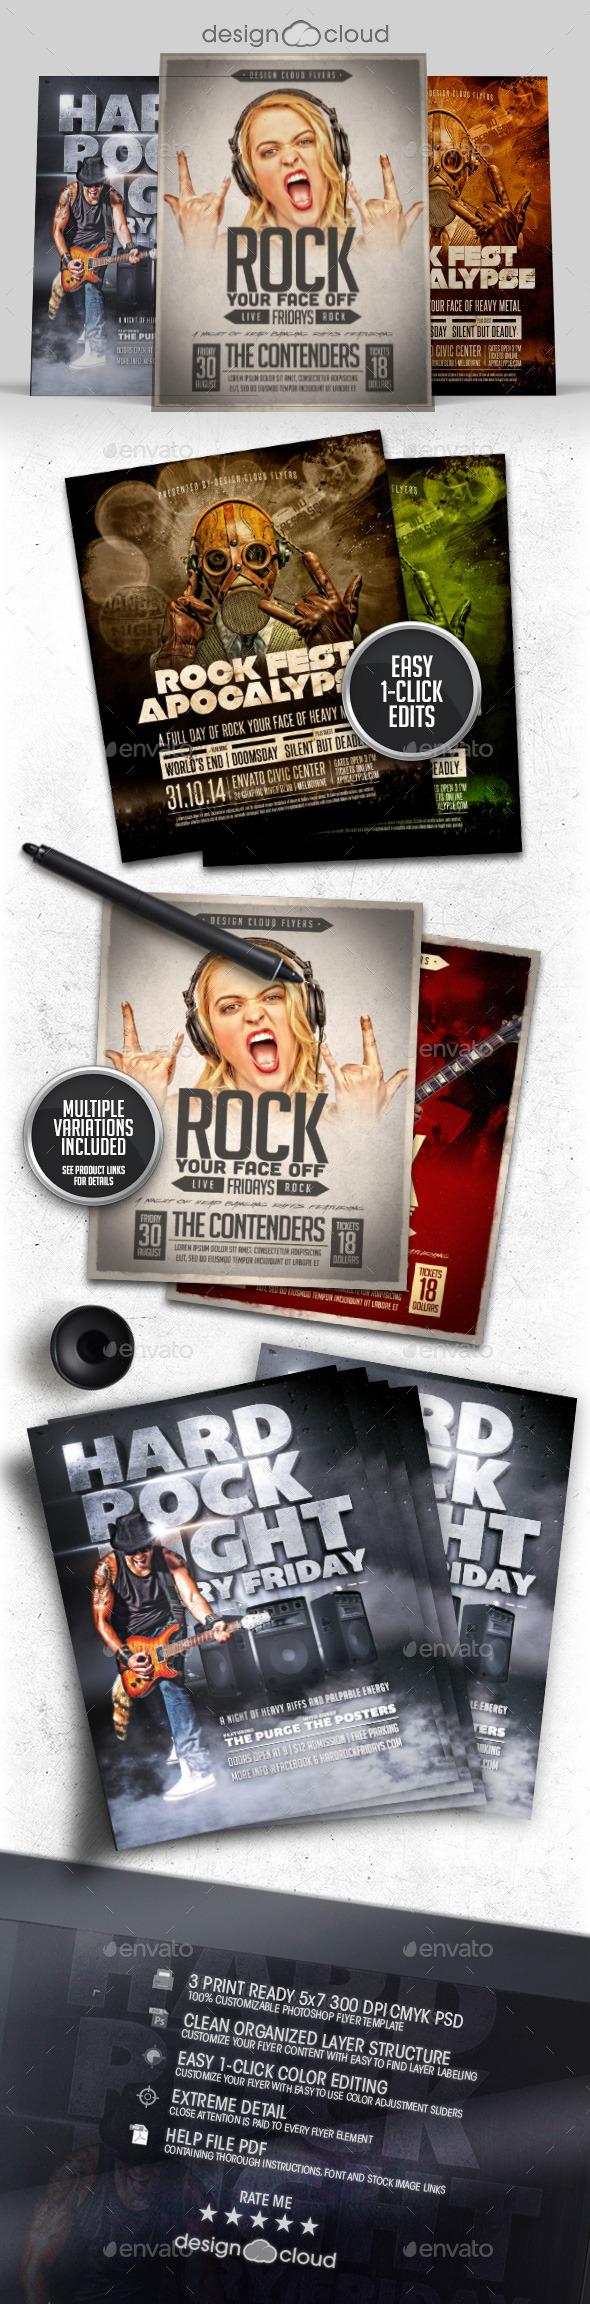 Rock-n-Roll Flyer / Poster Template Bundle - Concerts Events